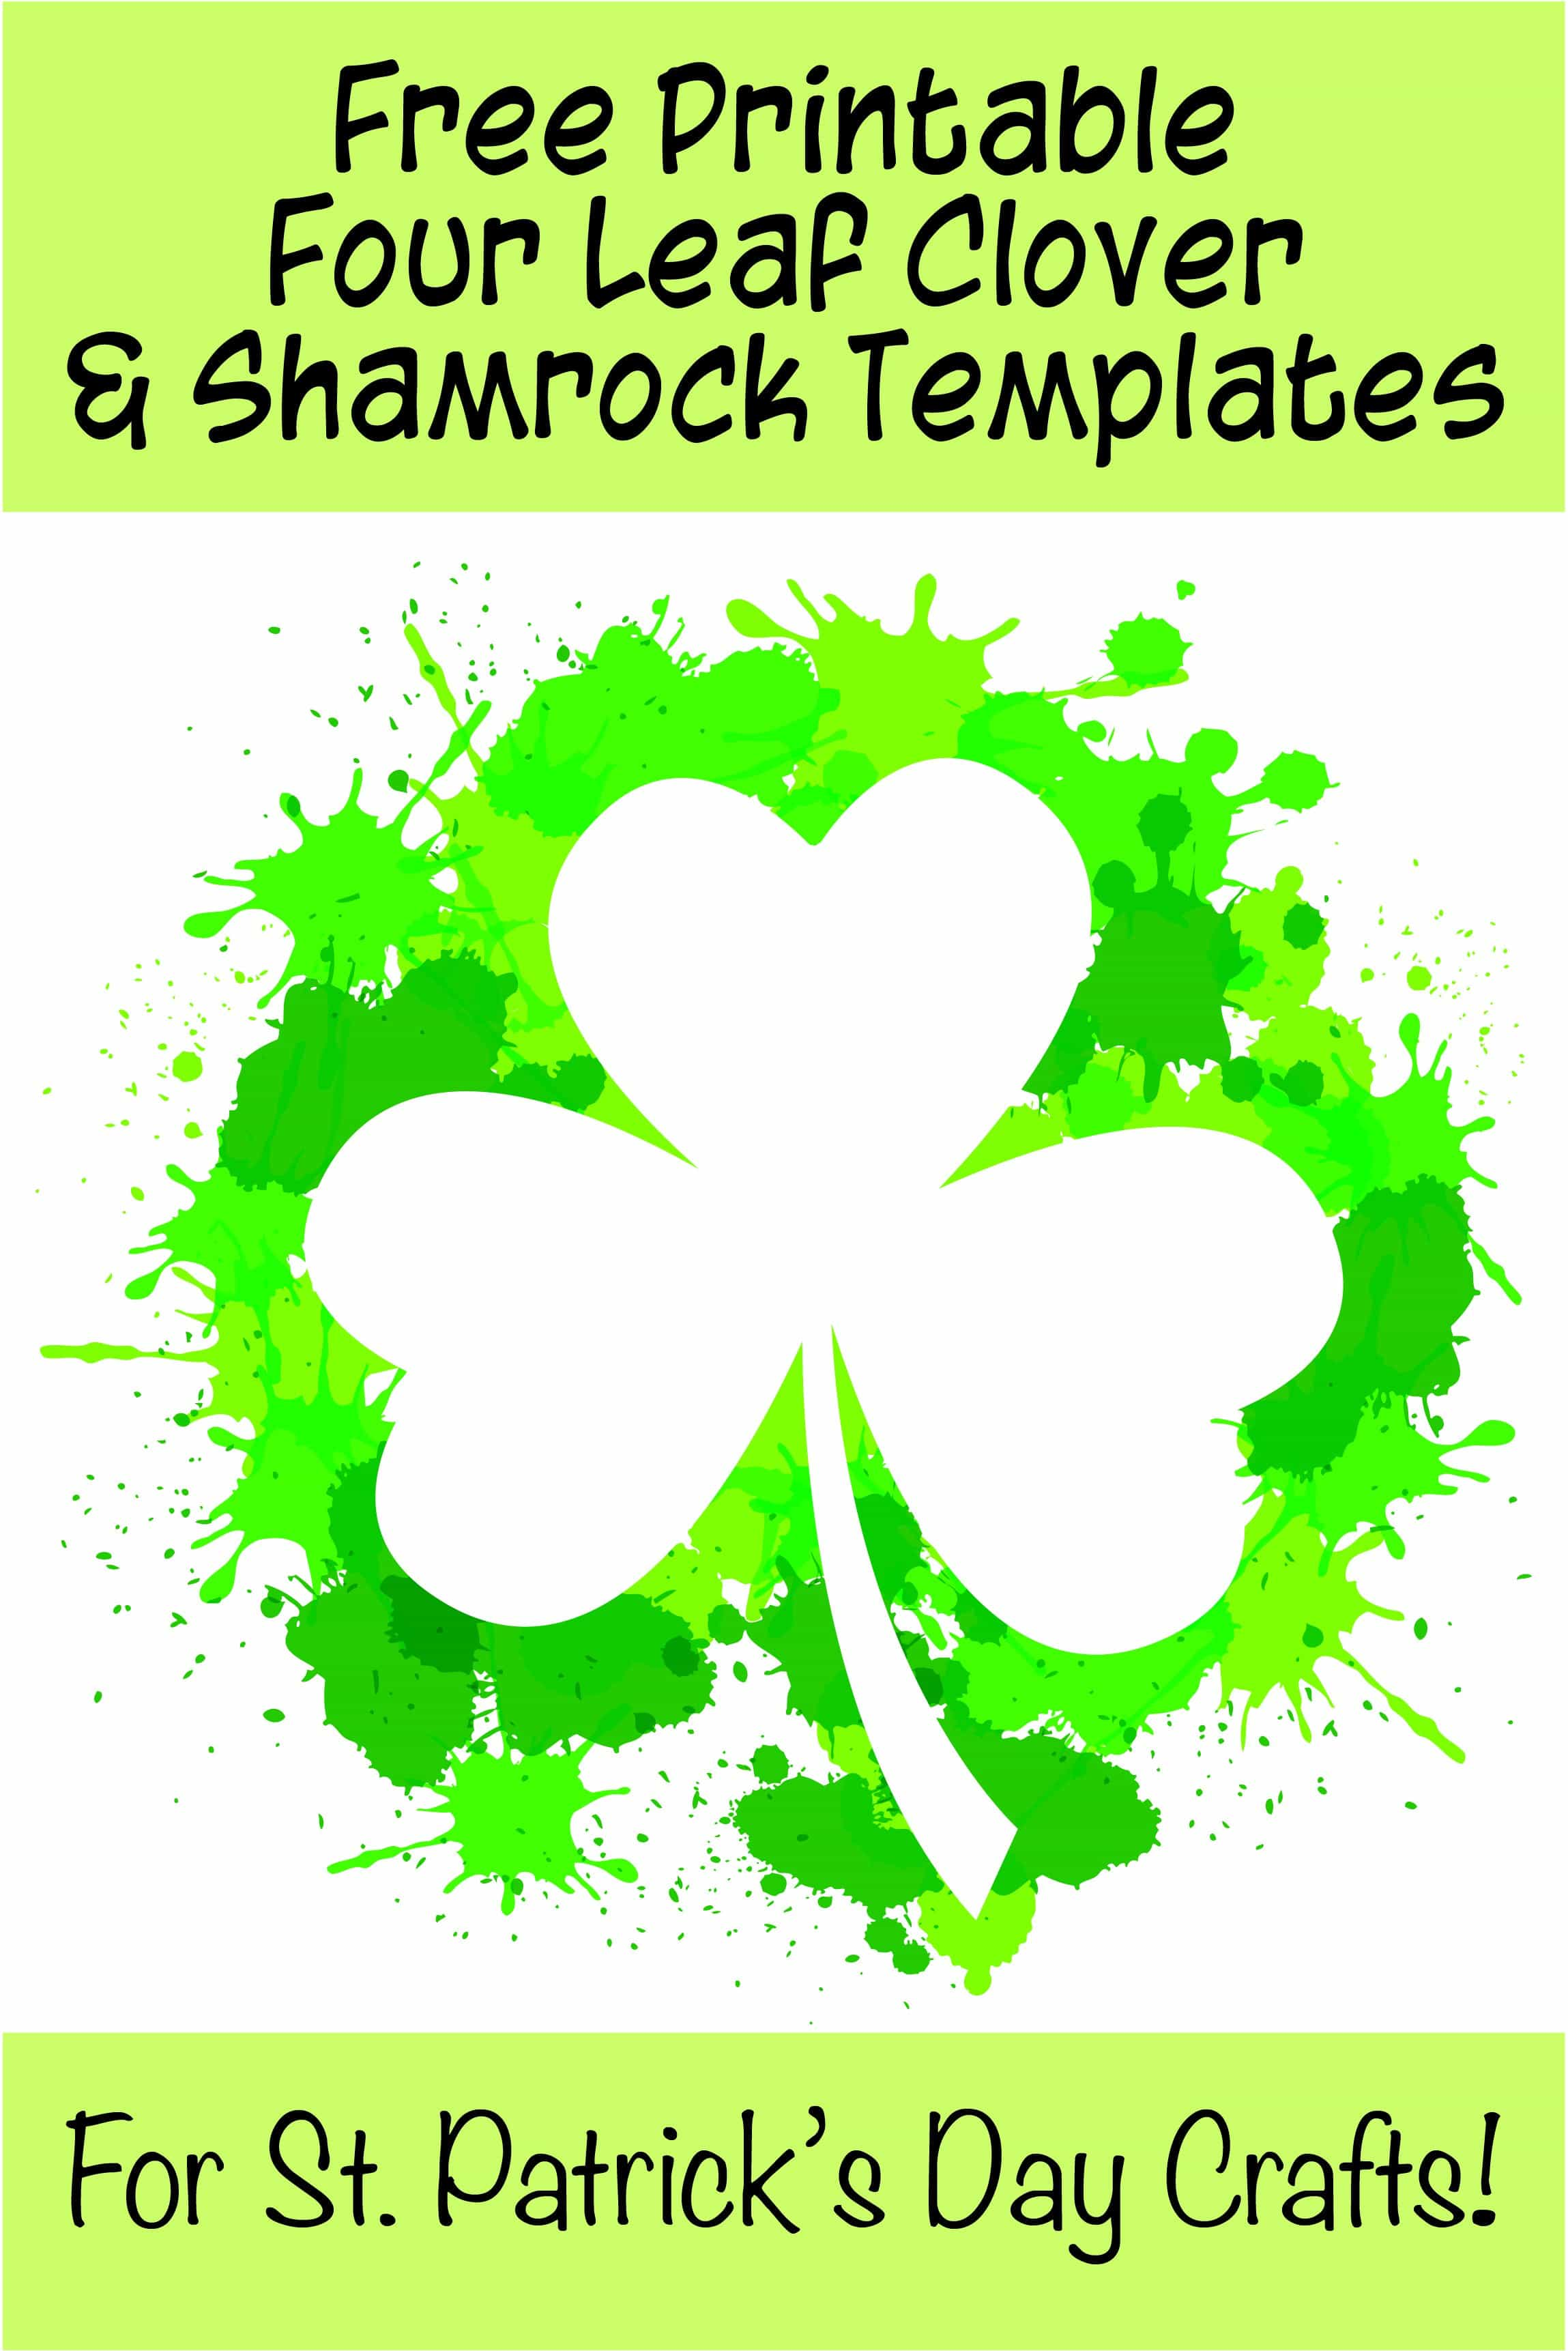 17 Free Printable Four Leaf Clover Amp Shamrock Templates